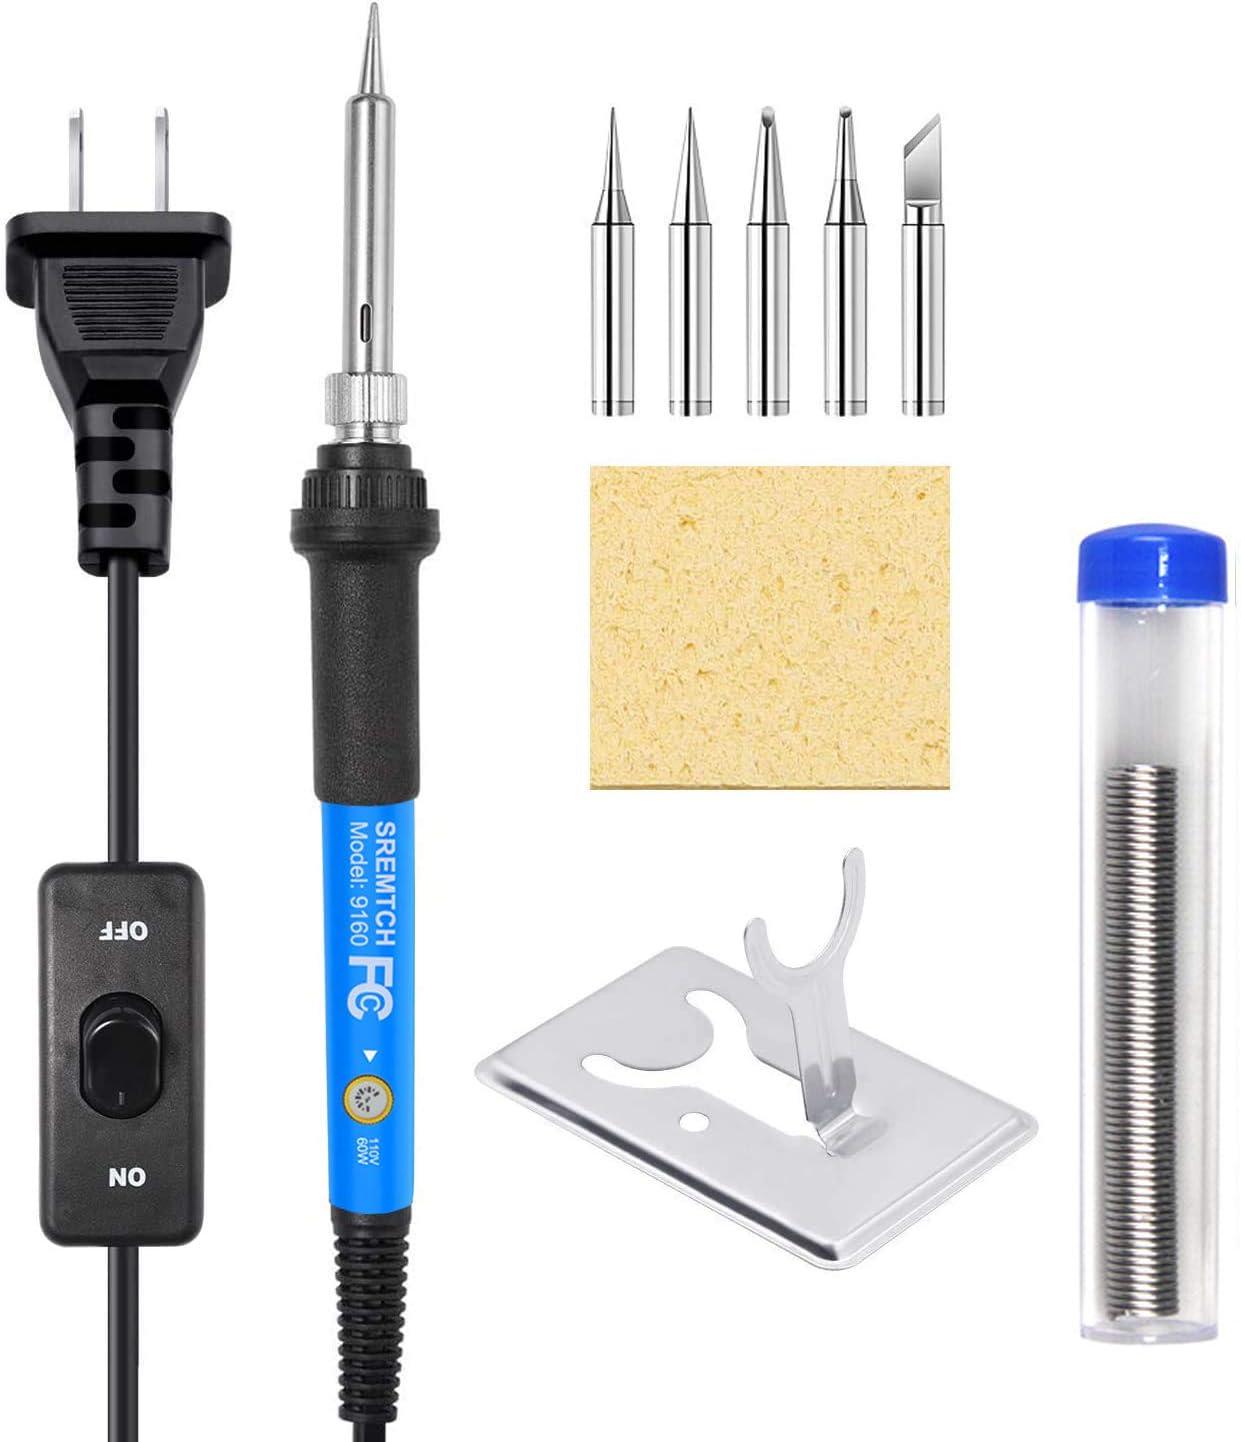 Soldering Iron Gun Kit Electrical Wire Tip Tool Set Solder Station 60W 110V 19Pc